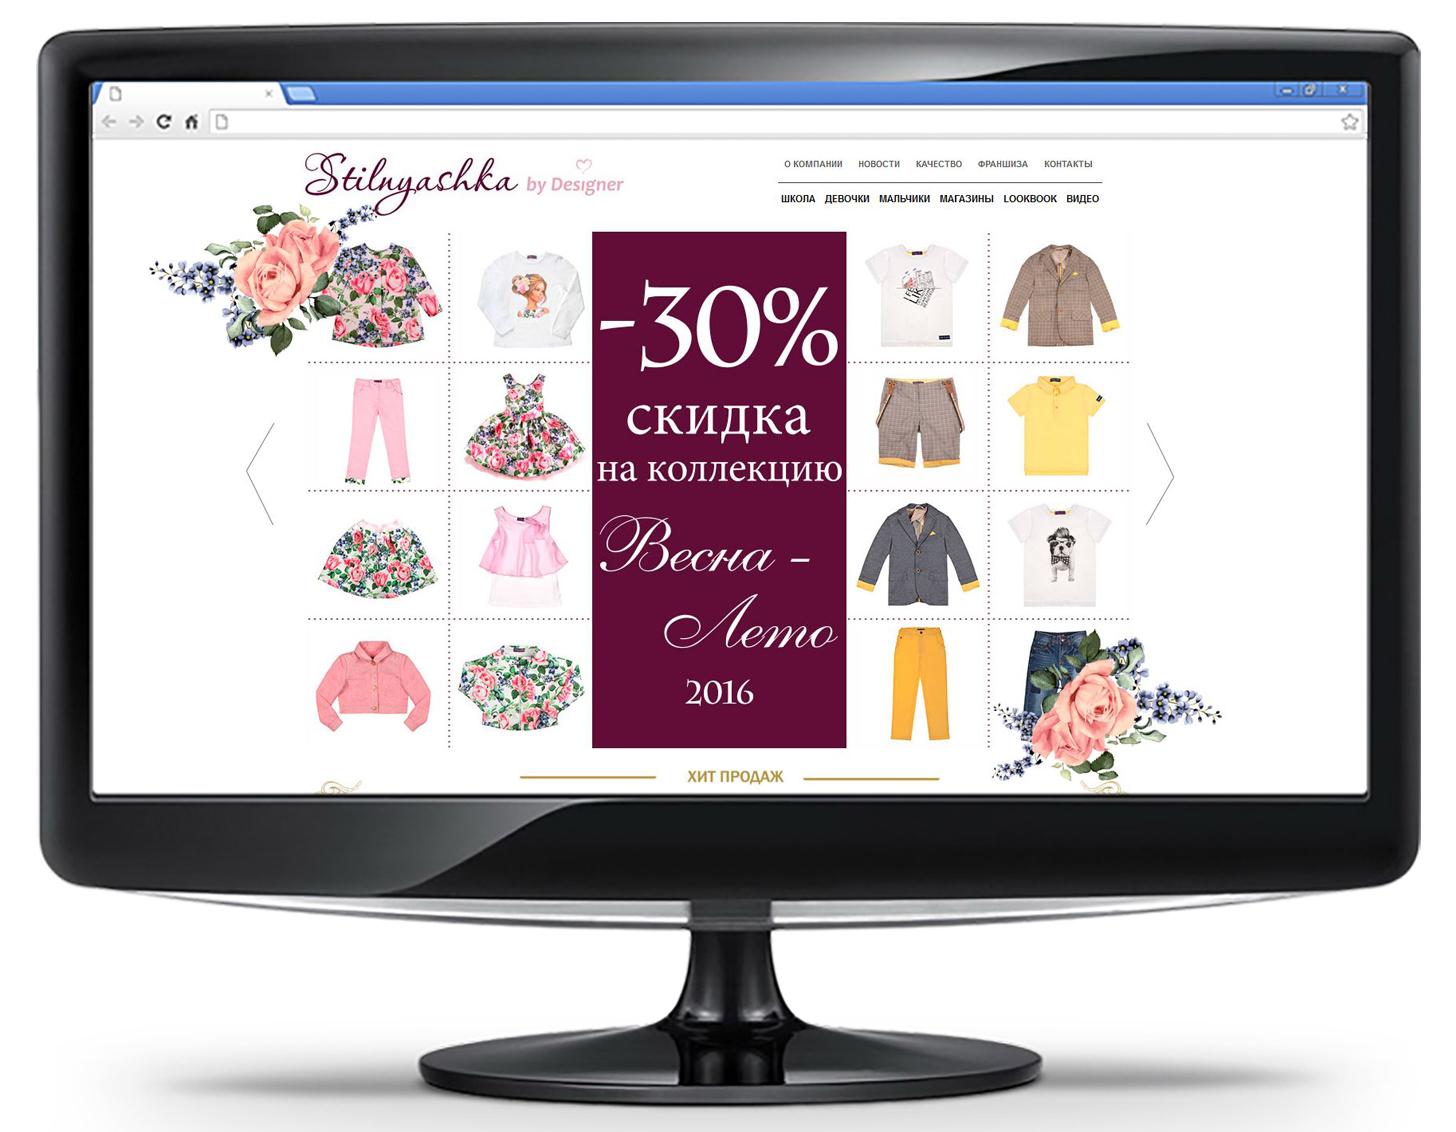 Баннер на слайдер - Скидка 30% Одежда